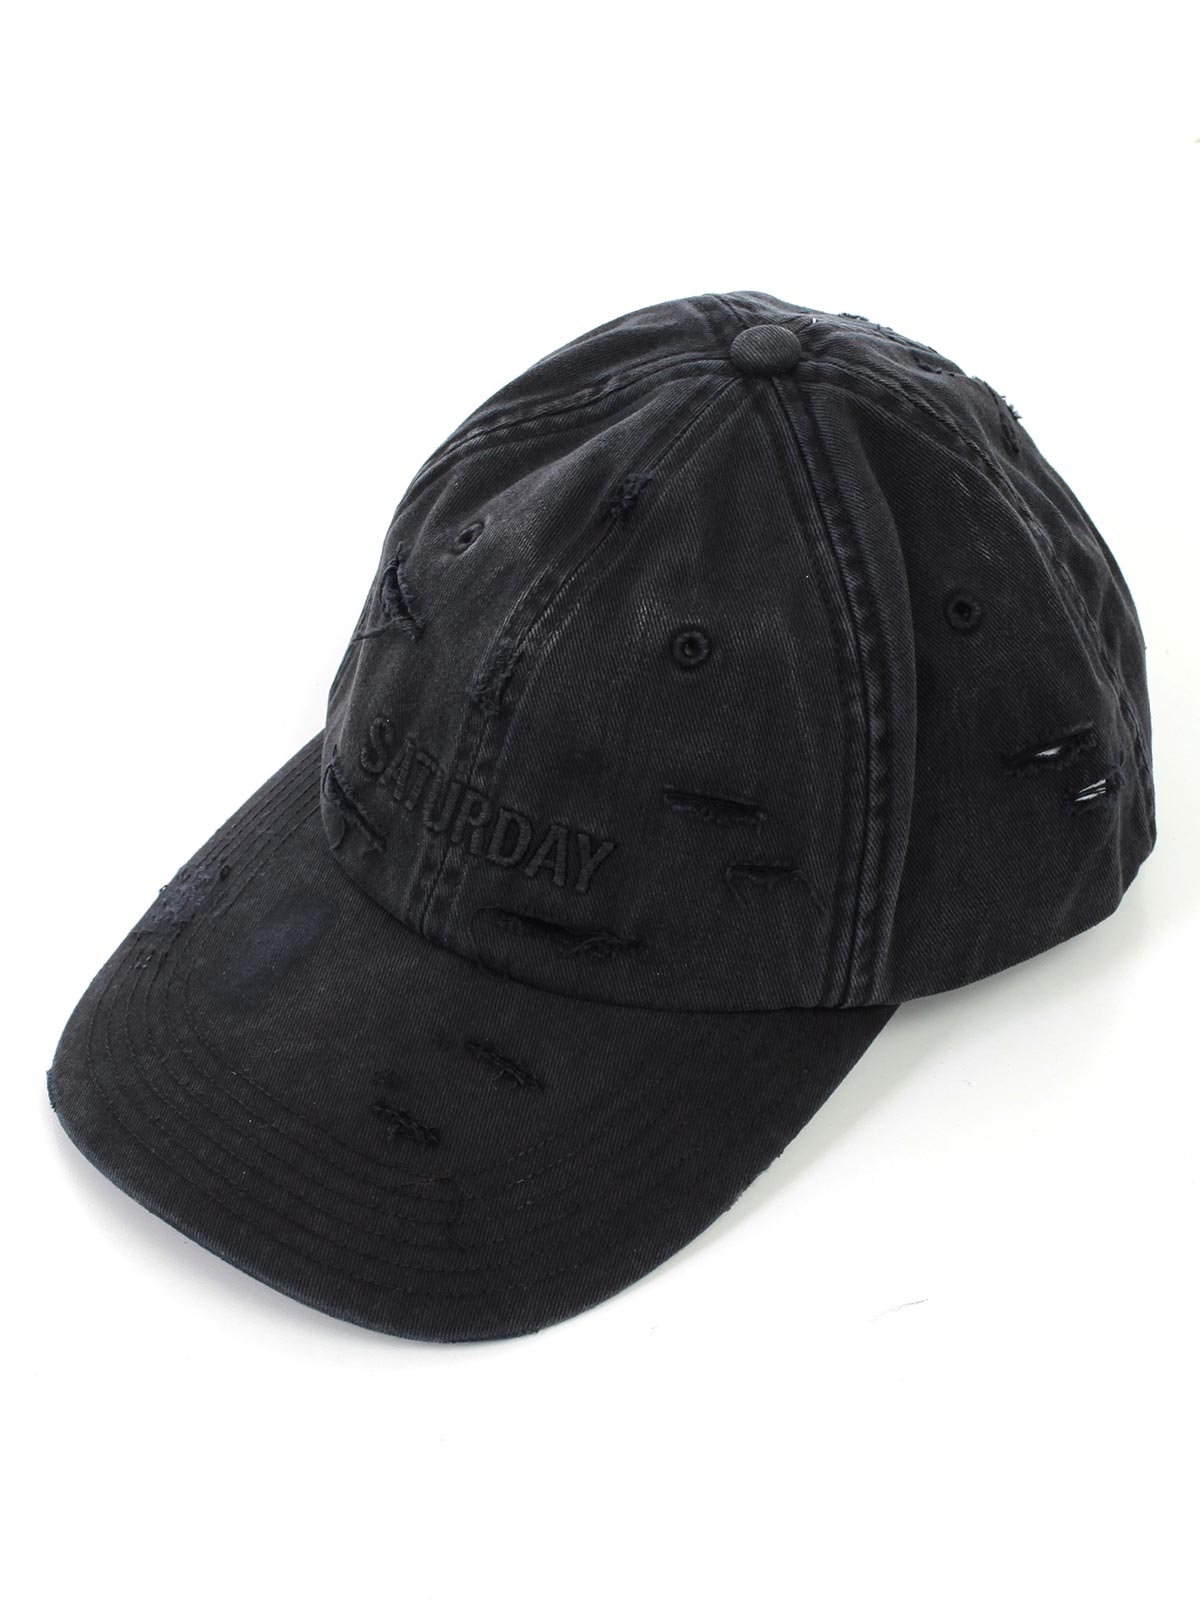 Vetements Hat USS198026 - SATURDAY.Bernardelli Store - Online ... 1697e87faa4